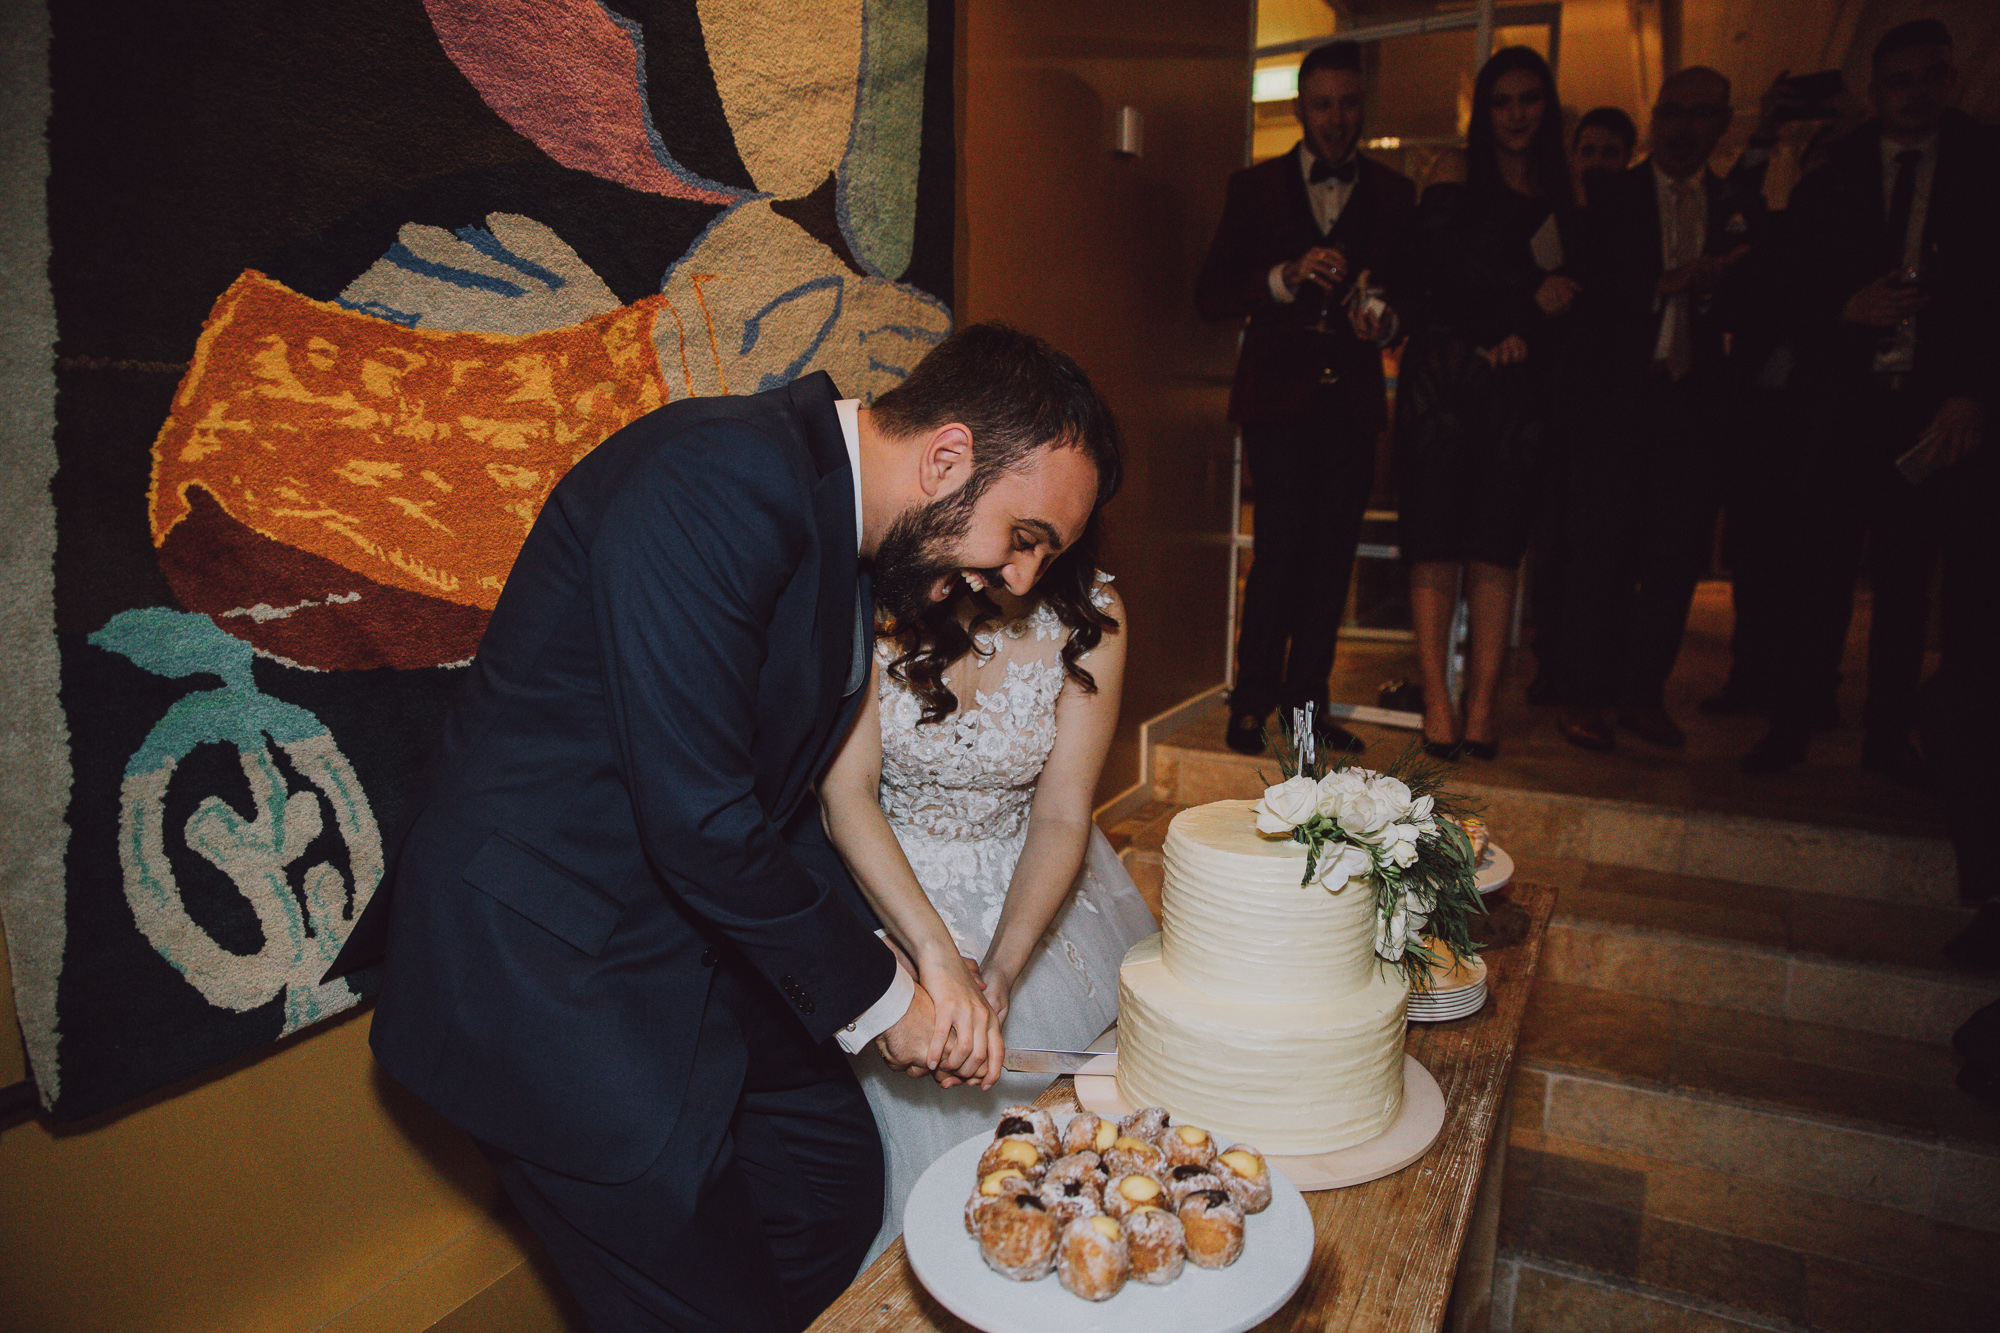 Wedding cake at Matakauri Lodge